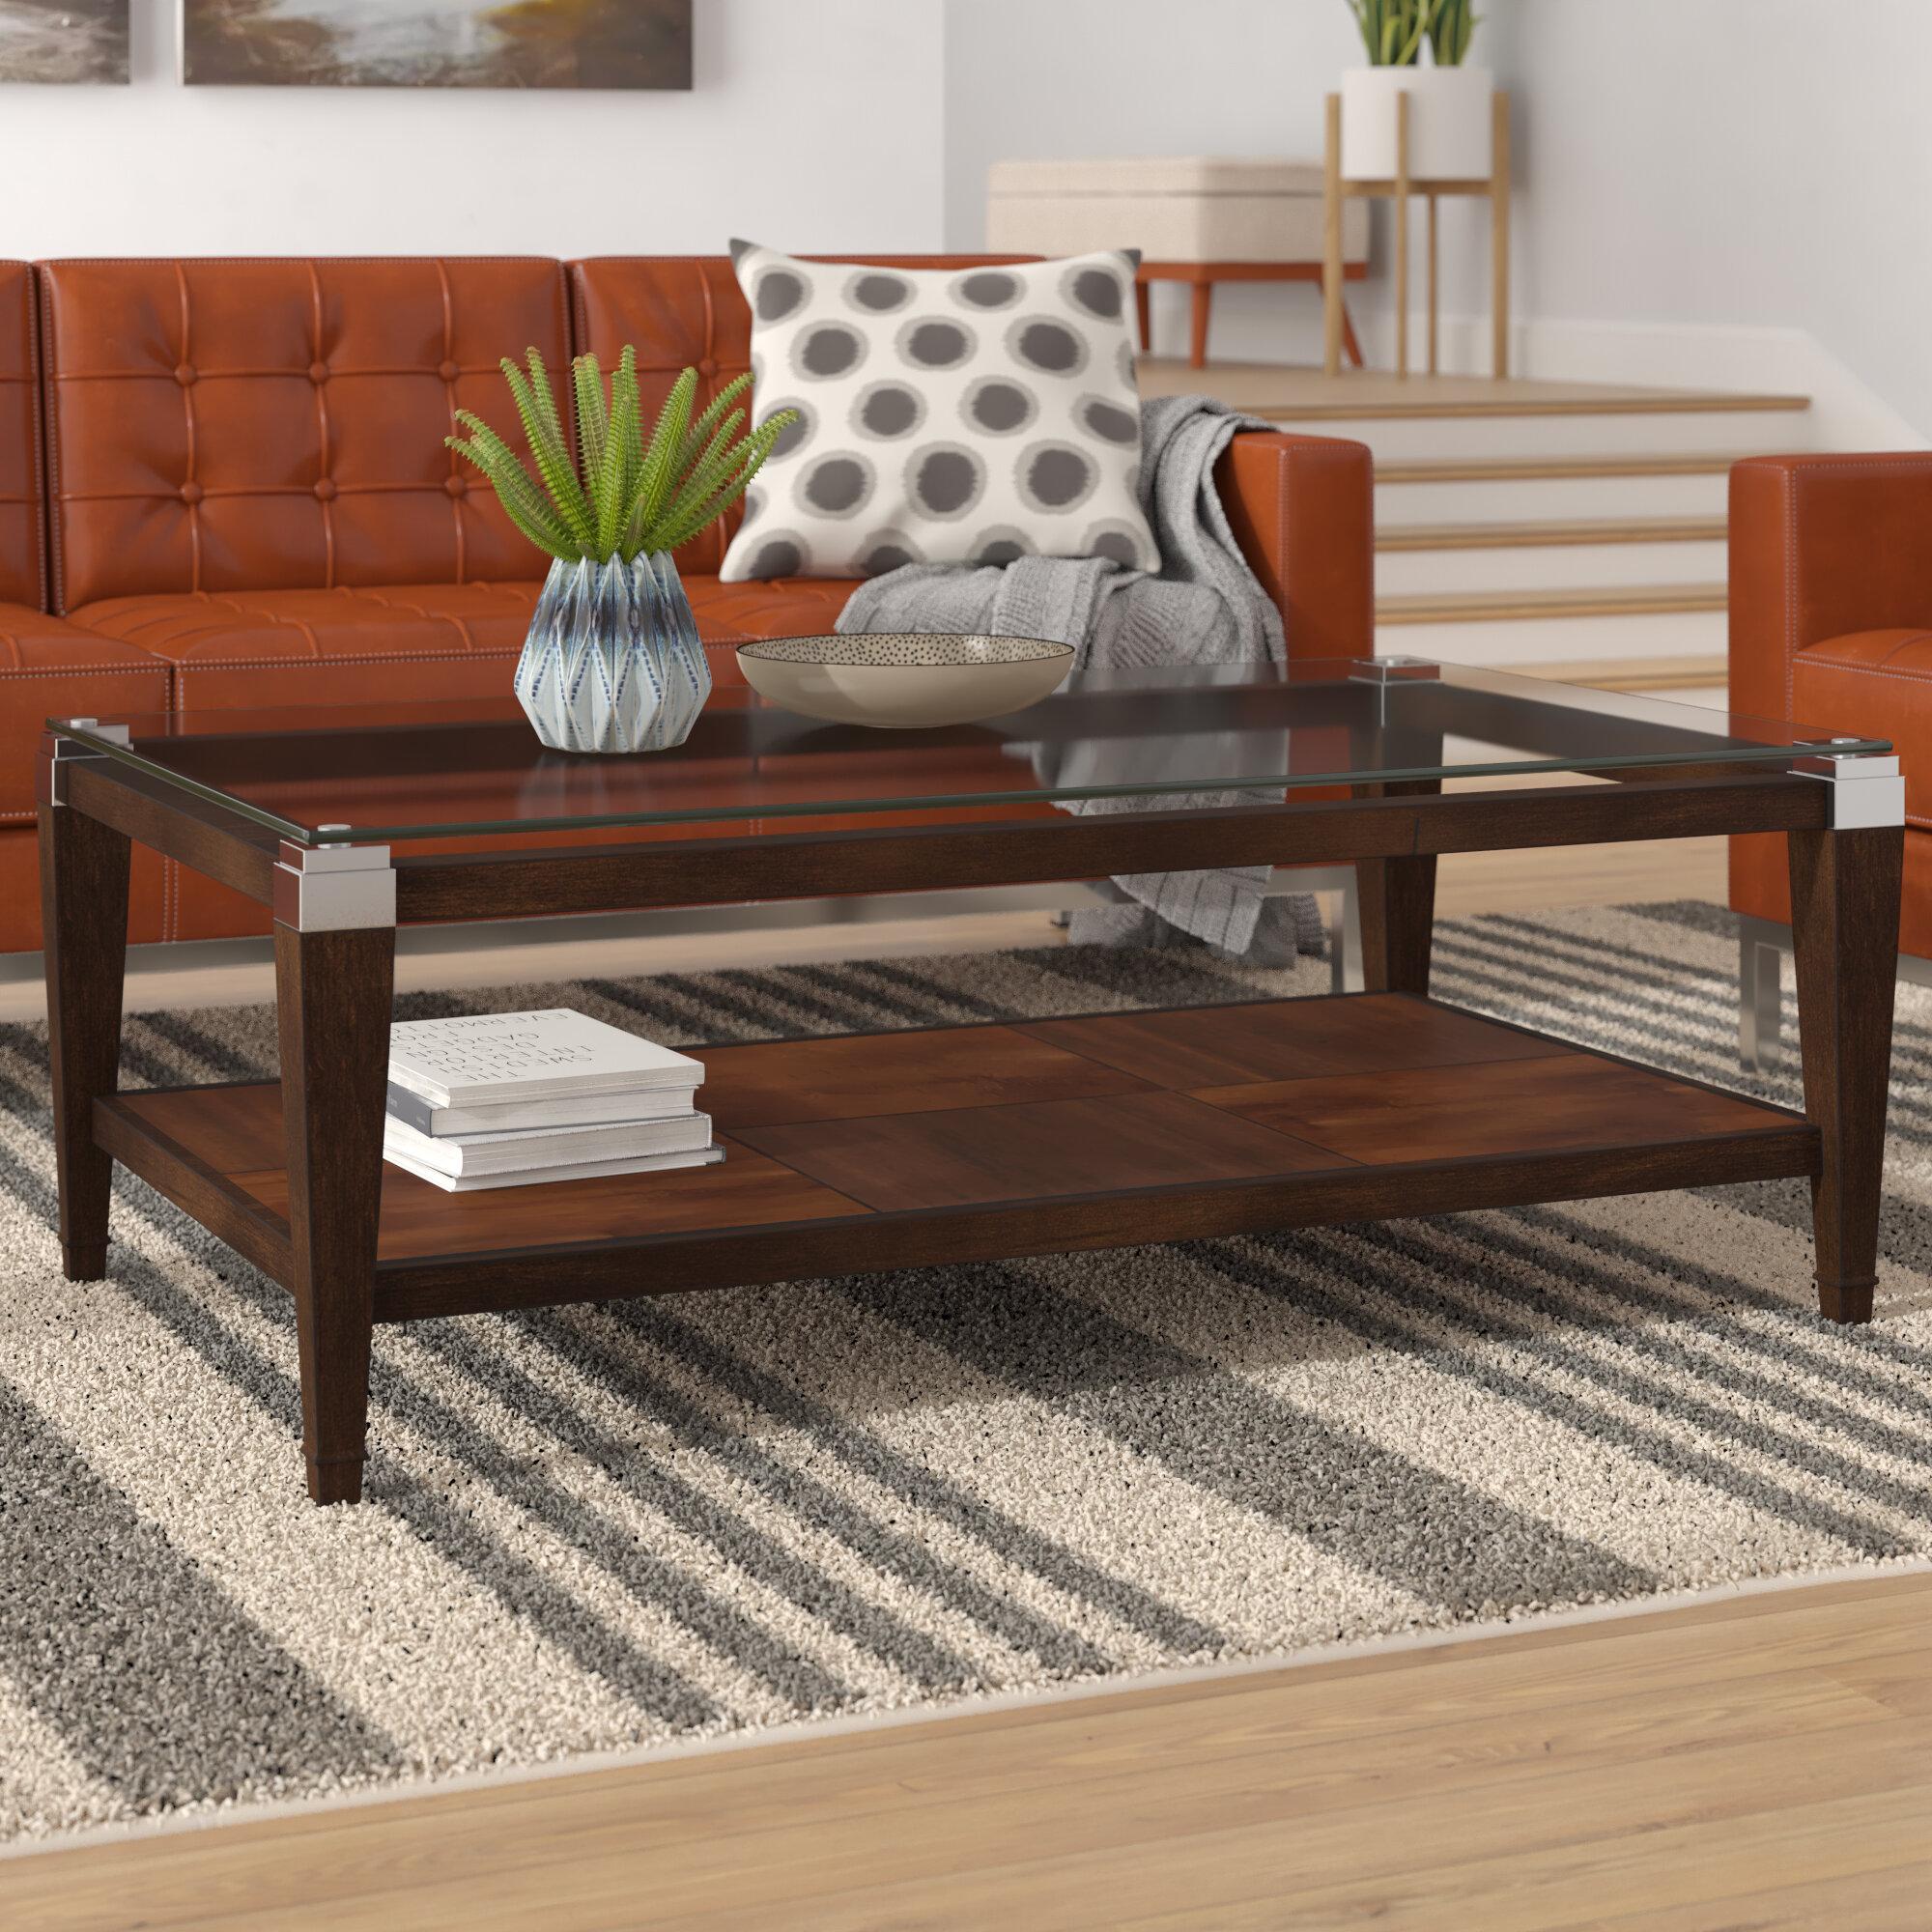 Hot Glass Coffee Table Rectangular Shelf Wood Chrome Top Wooden Frame Furniture